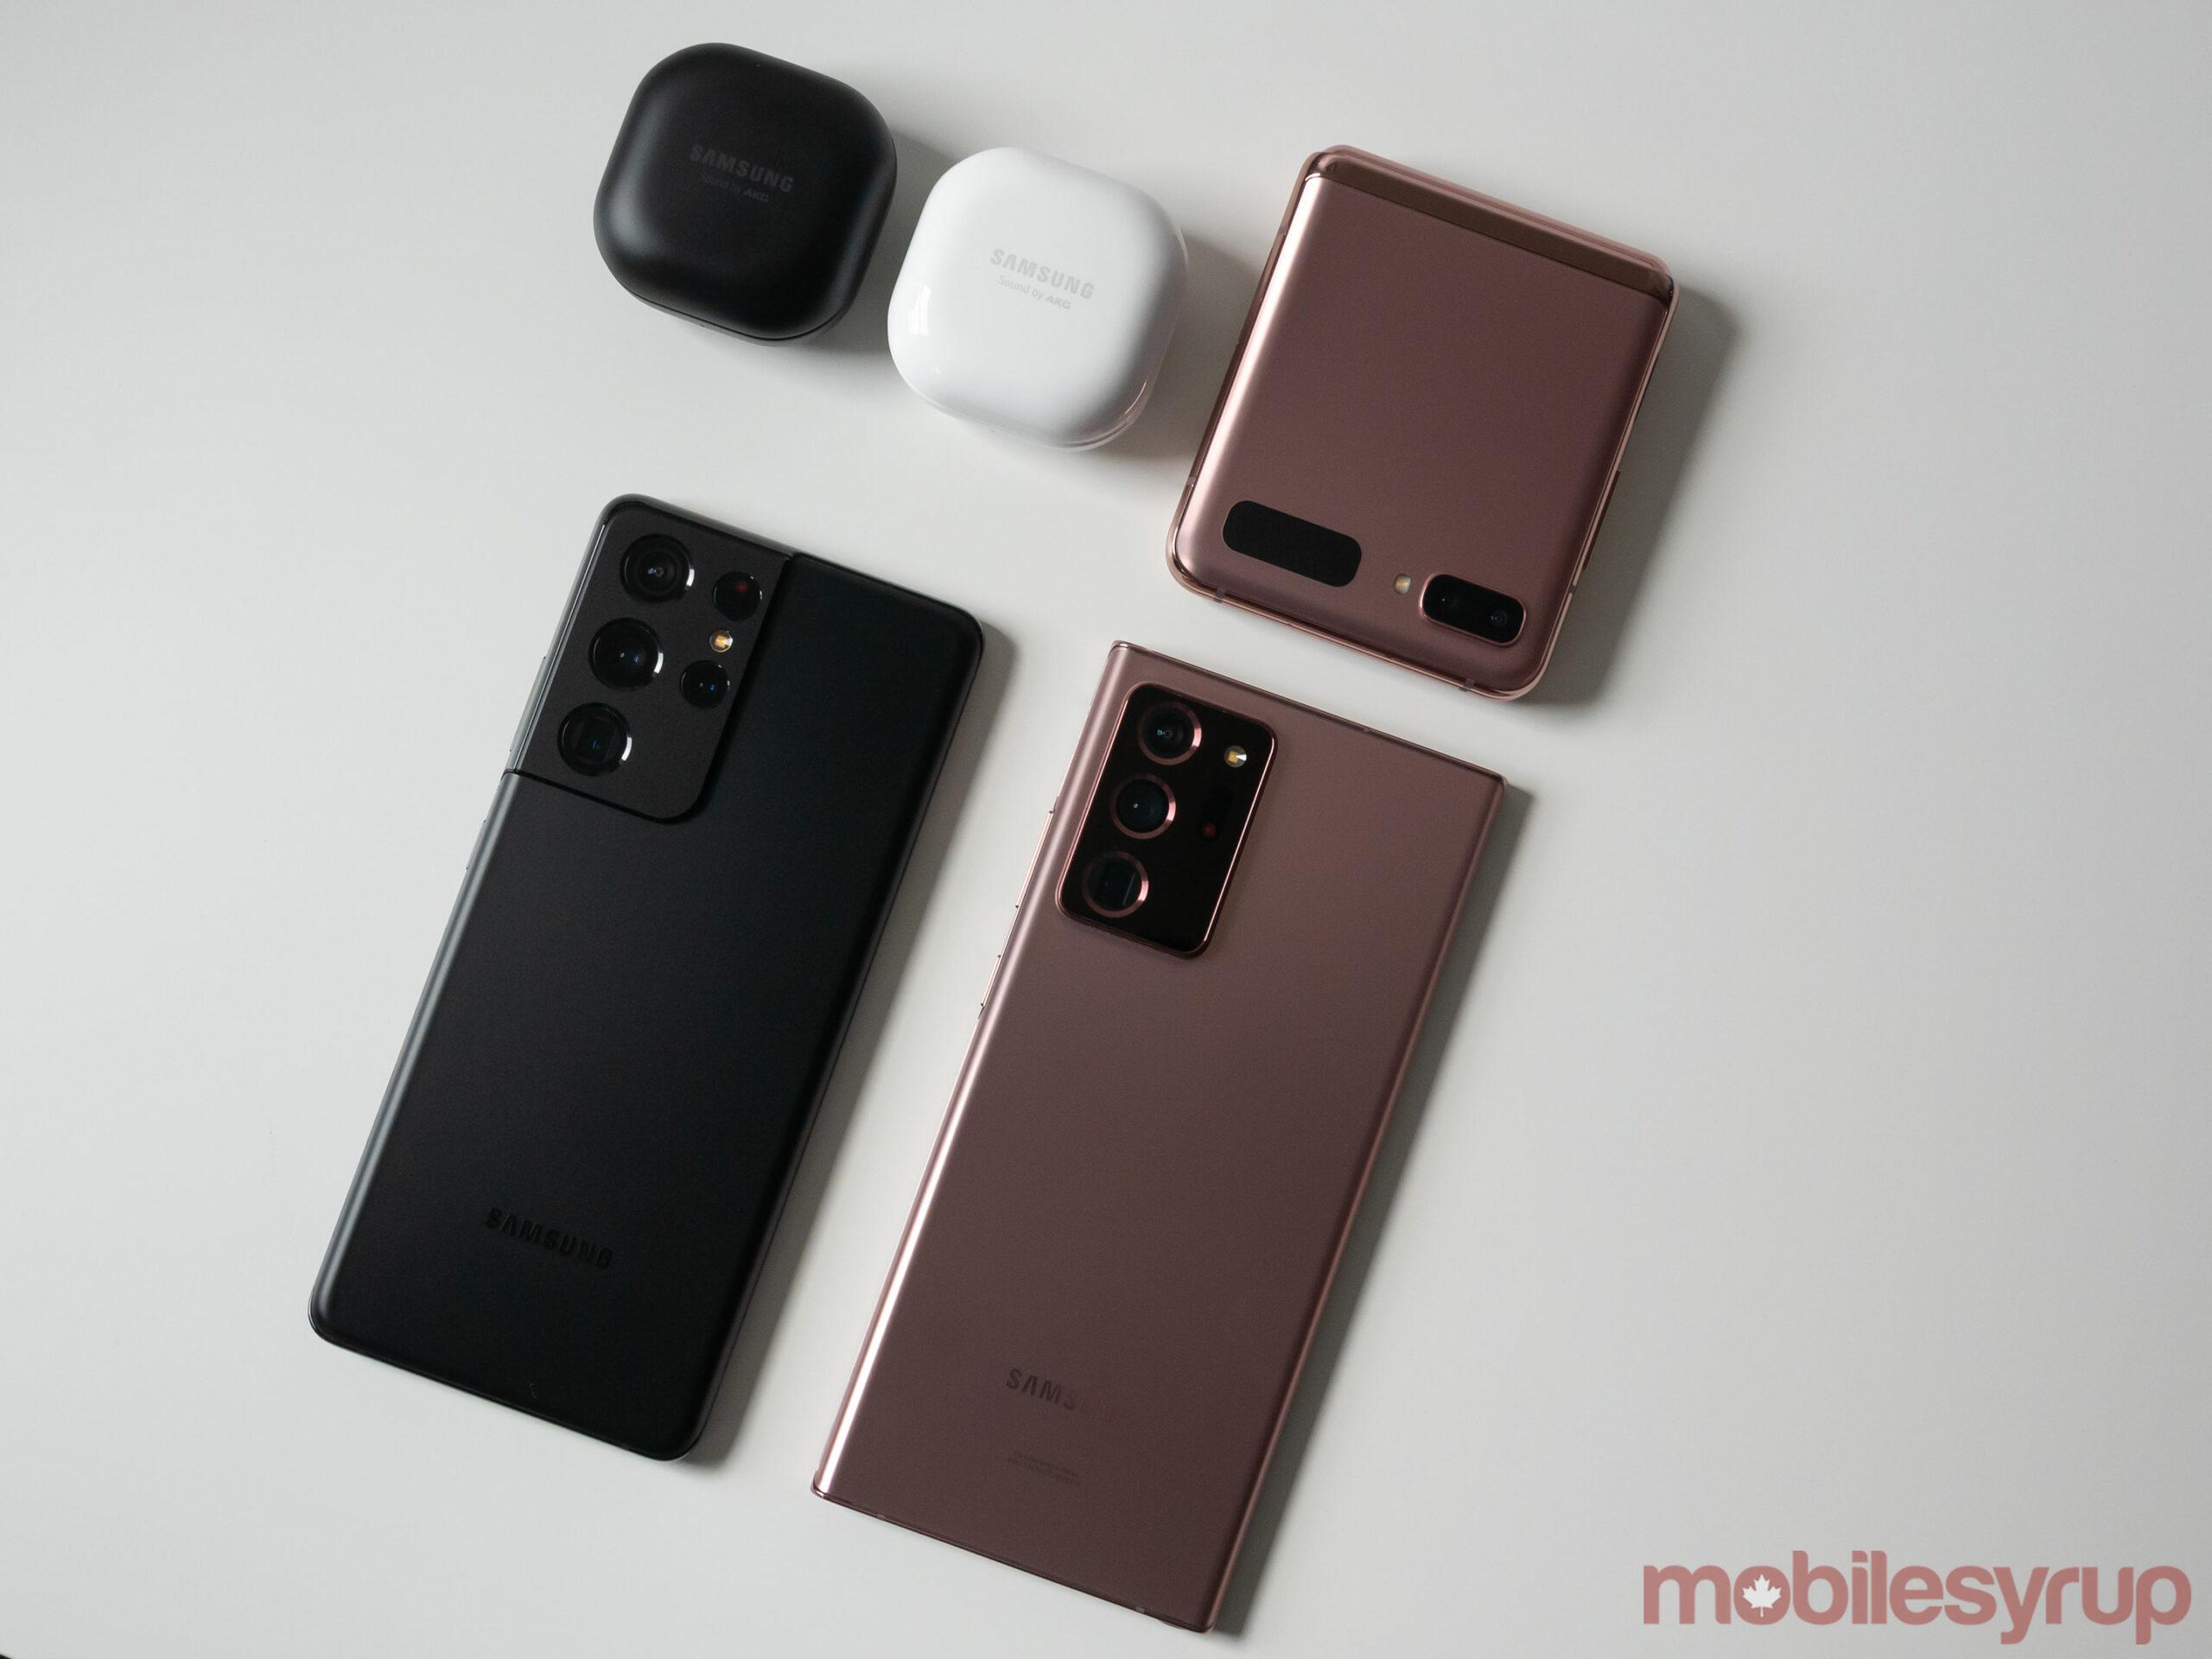 The Galaxy Buds Pro, Galaxy Buds Live, Galazy Z Flip 5G, Galaxy S21 Ultra and Galaxy Note 20 Ultra